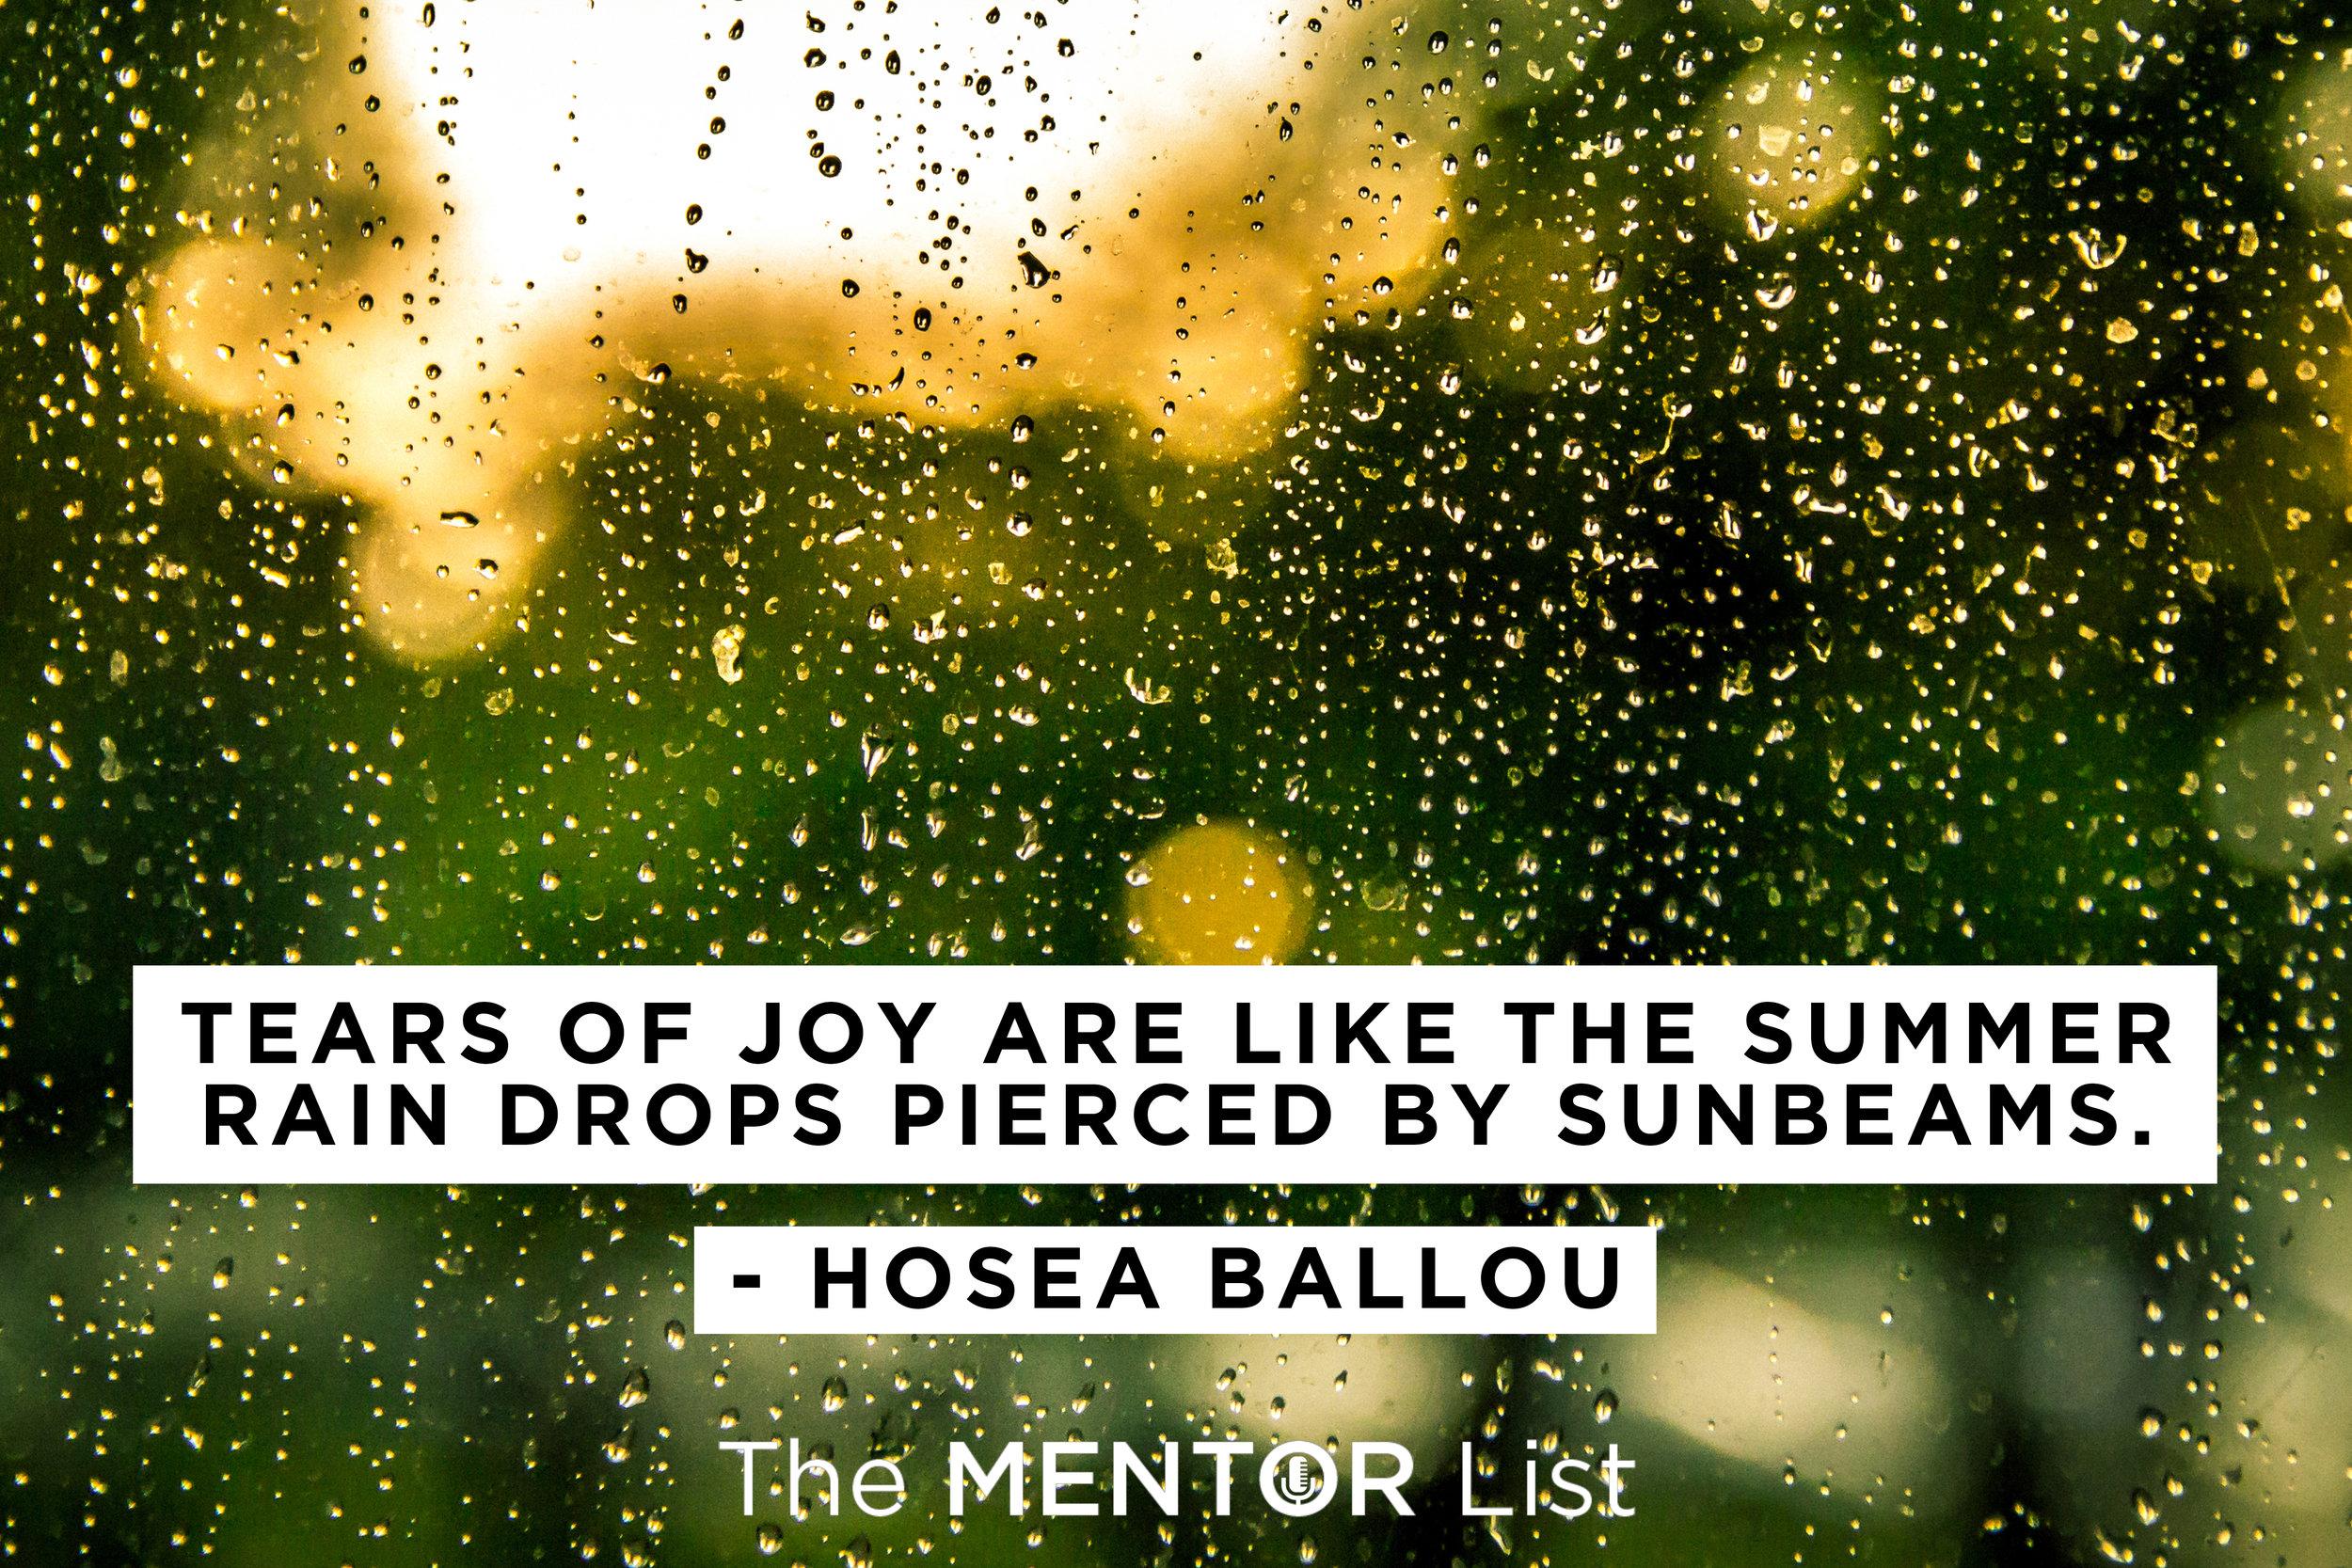 The Mentor List